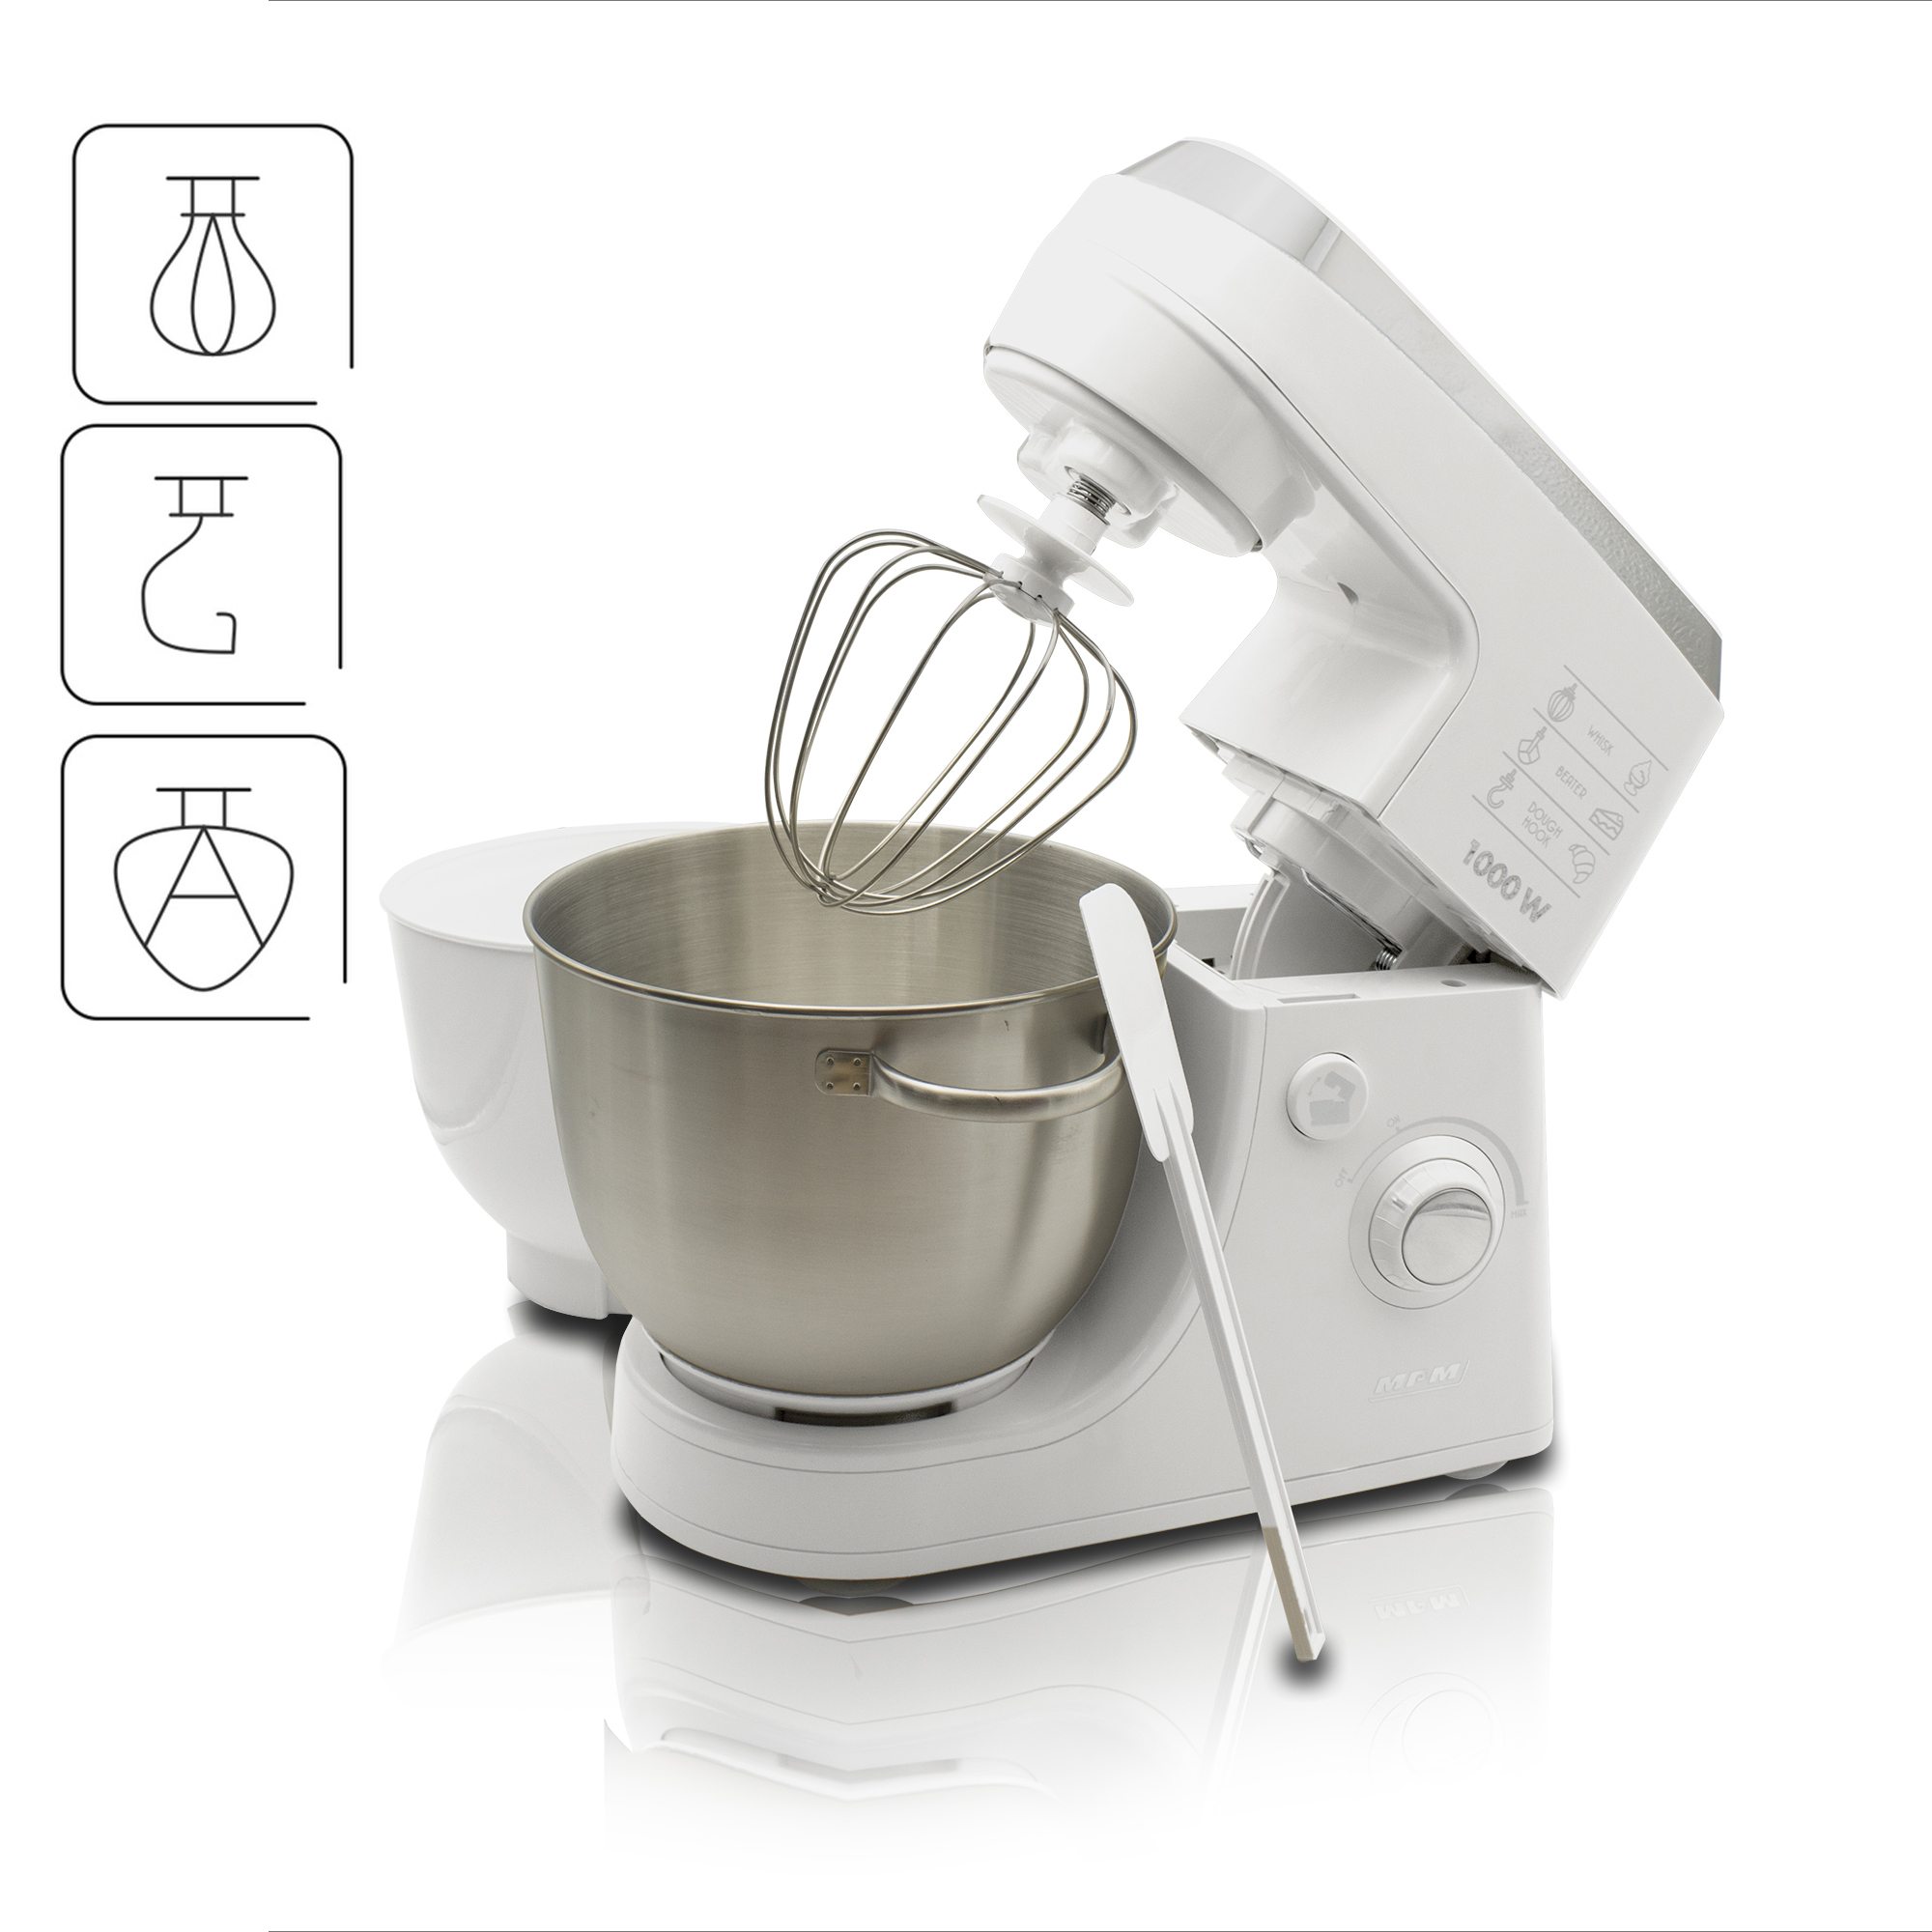 MPM MMR-12 Batidora Amasadora repostería Profesional Robot Cocina Orbital, Velocidad electrónica, 2 x BOL 4,2 litros, 1000W, Blanco